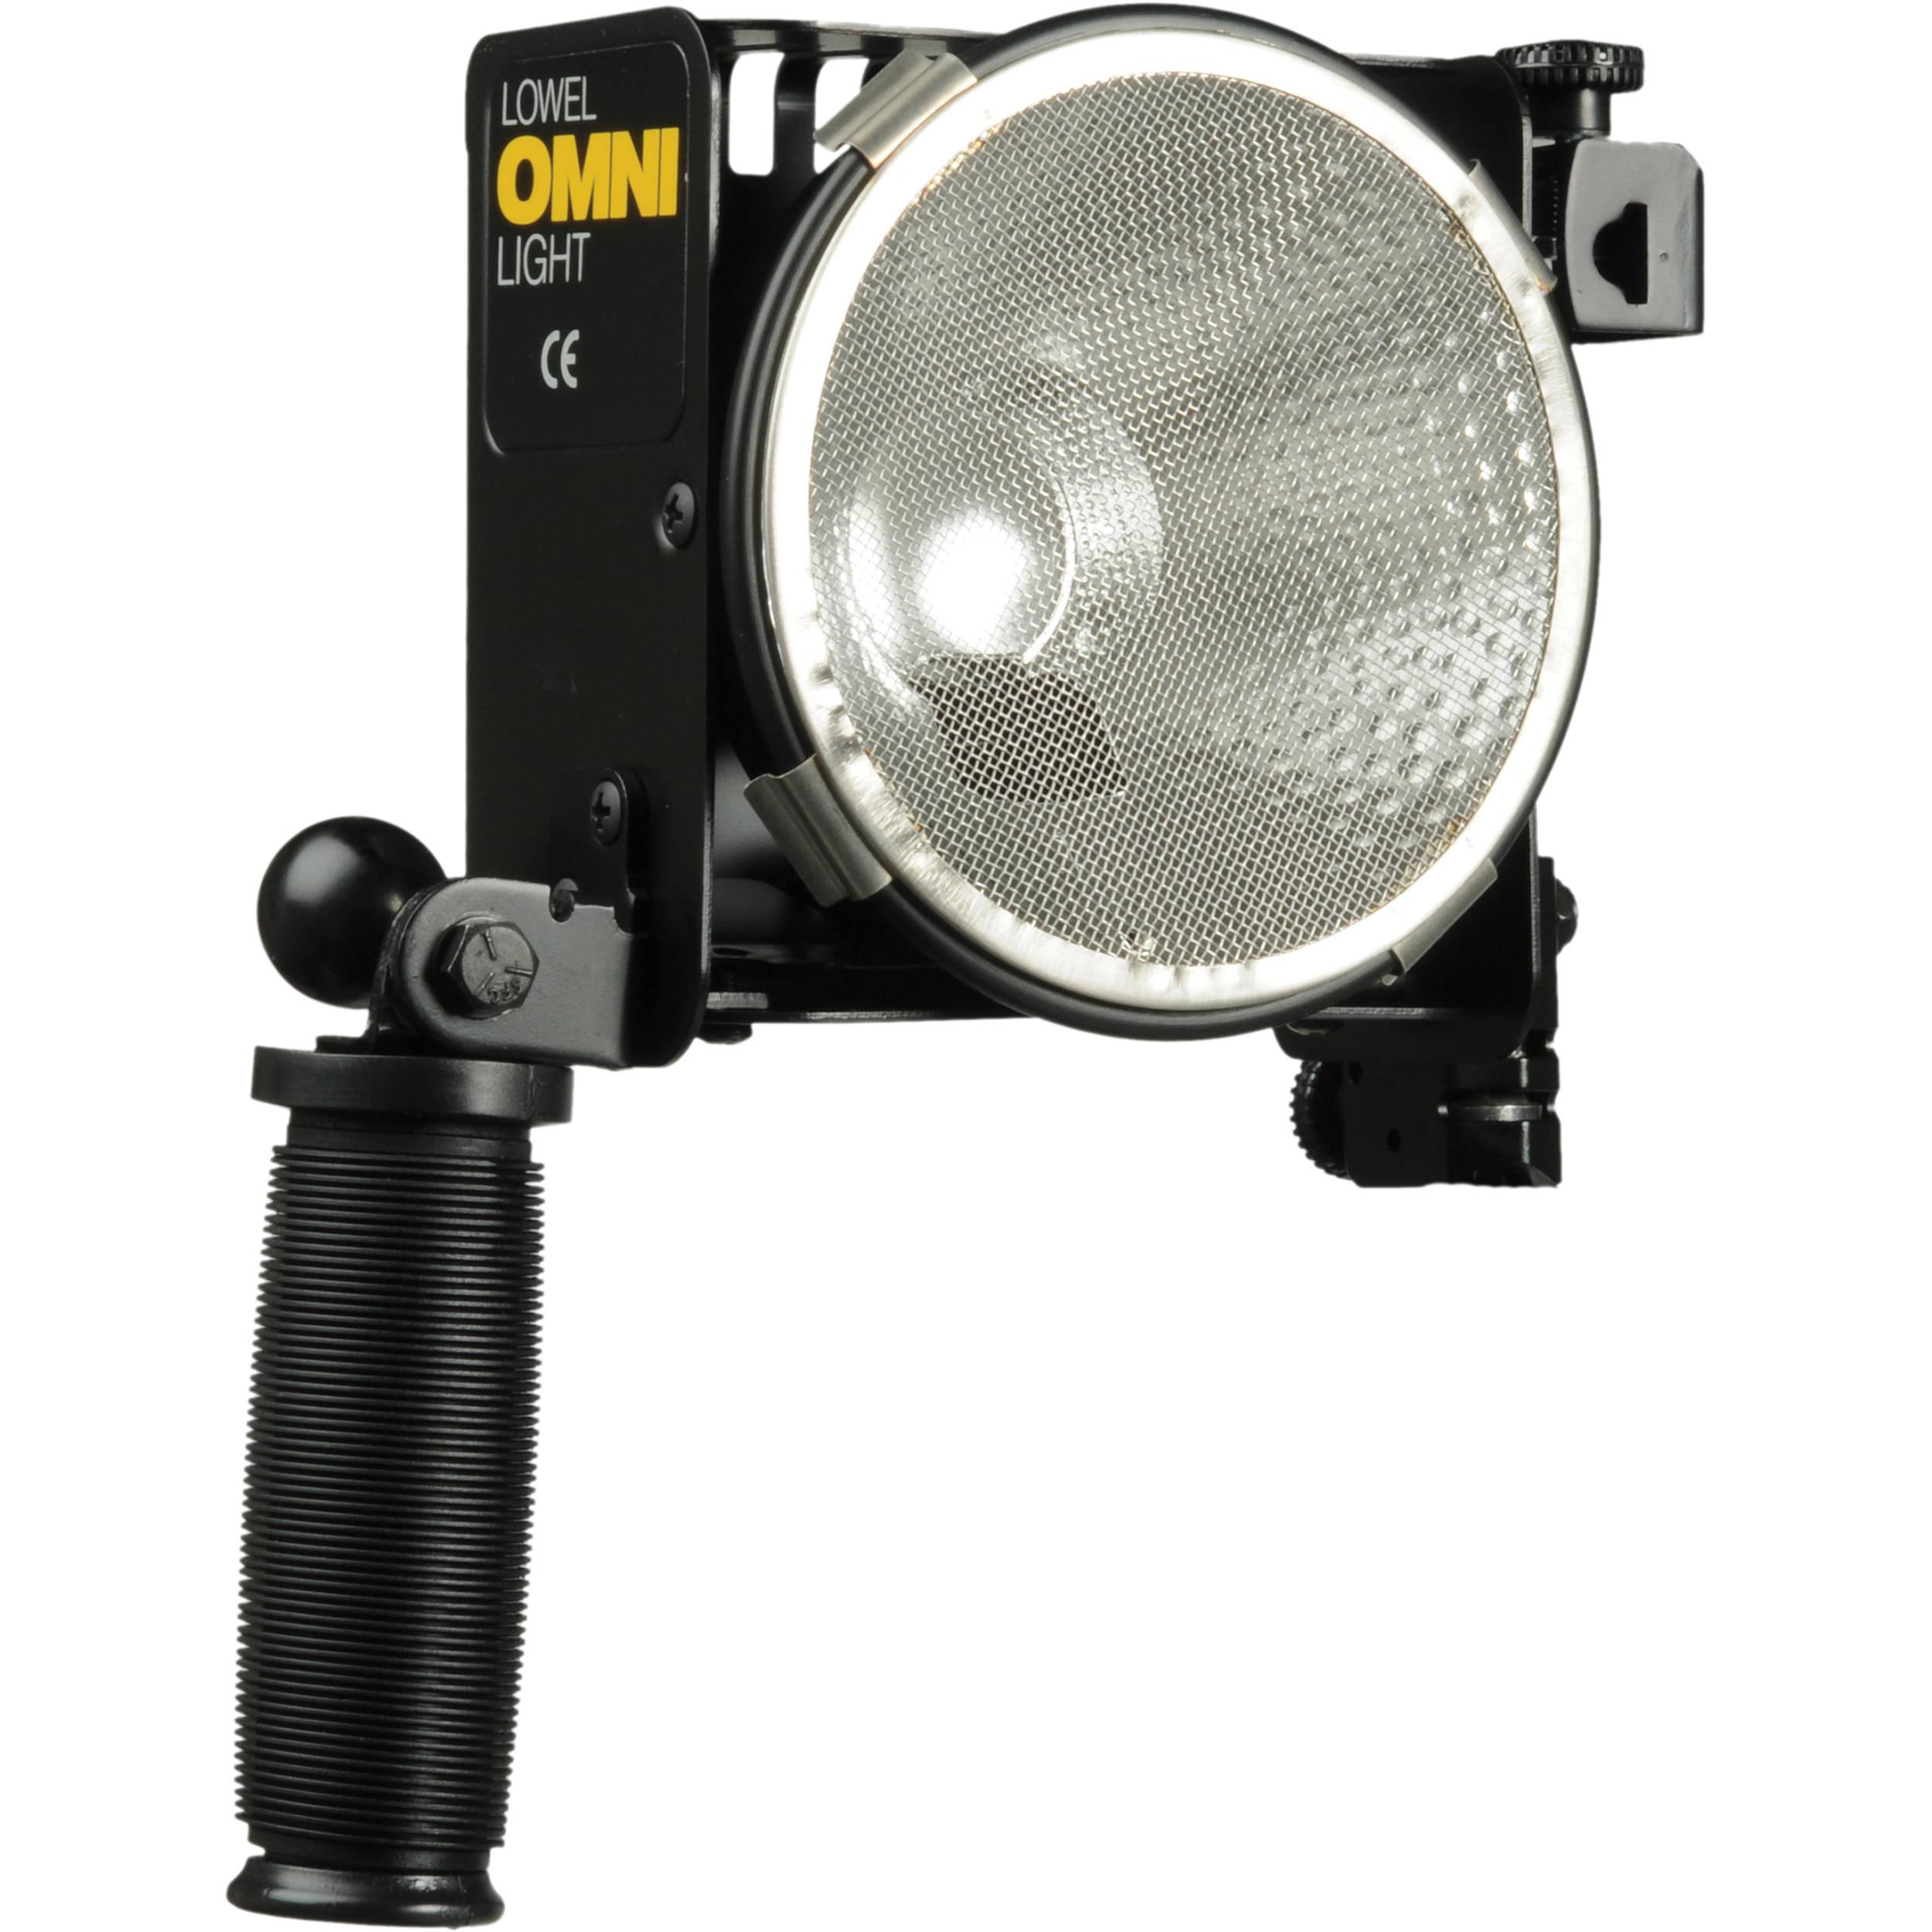 Lowel omni light 500 watt focus flood light o1 10 bh photo lowel omni light 500 watt focus flood light 120 240 vac 12 aloadofball Choice Image